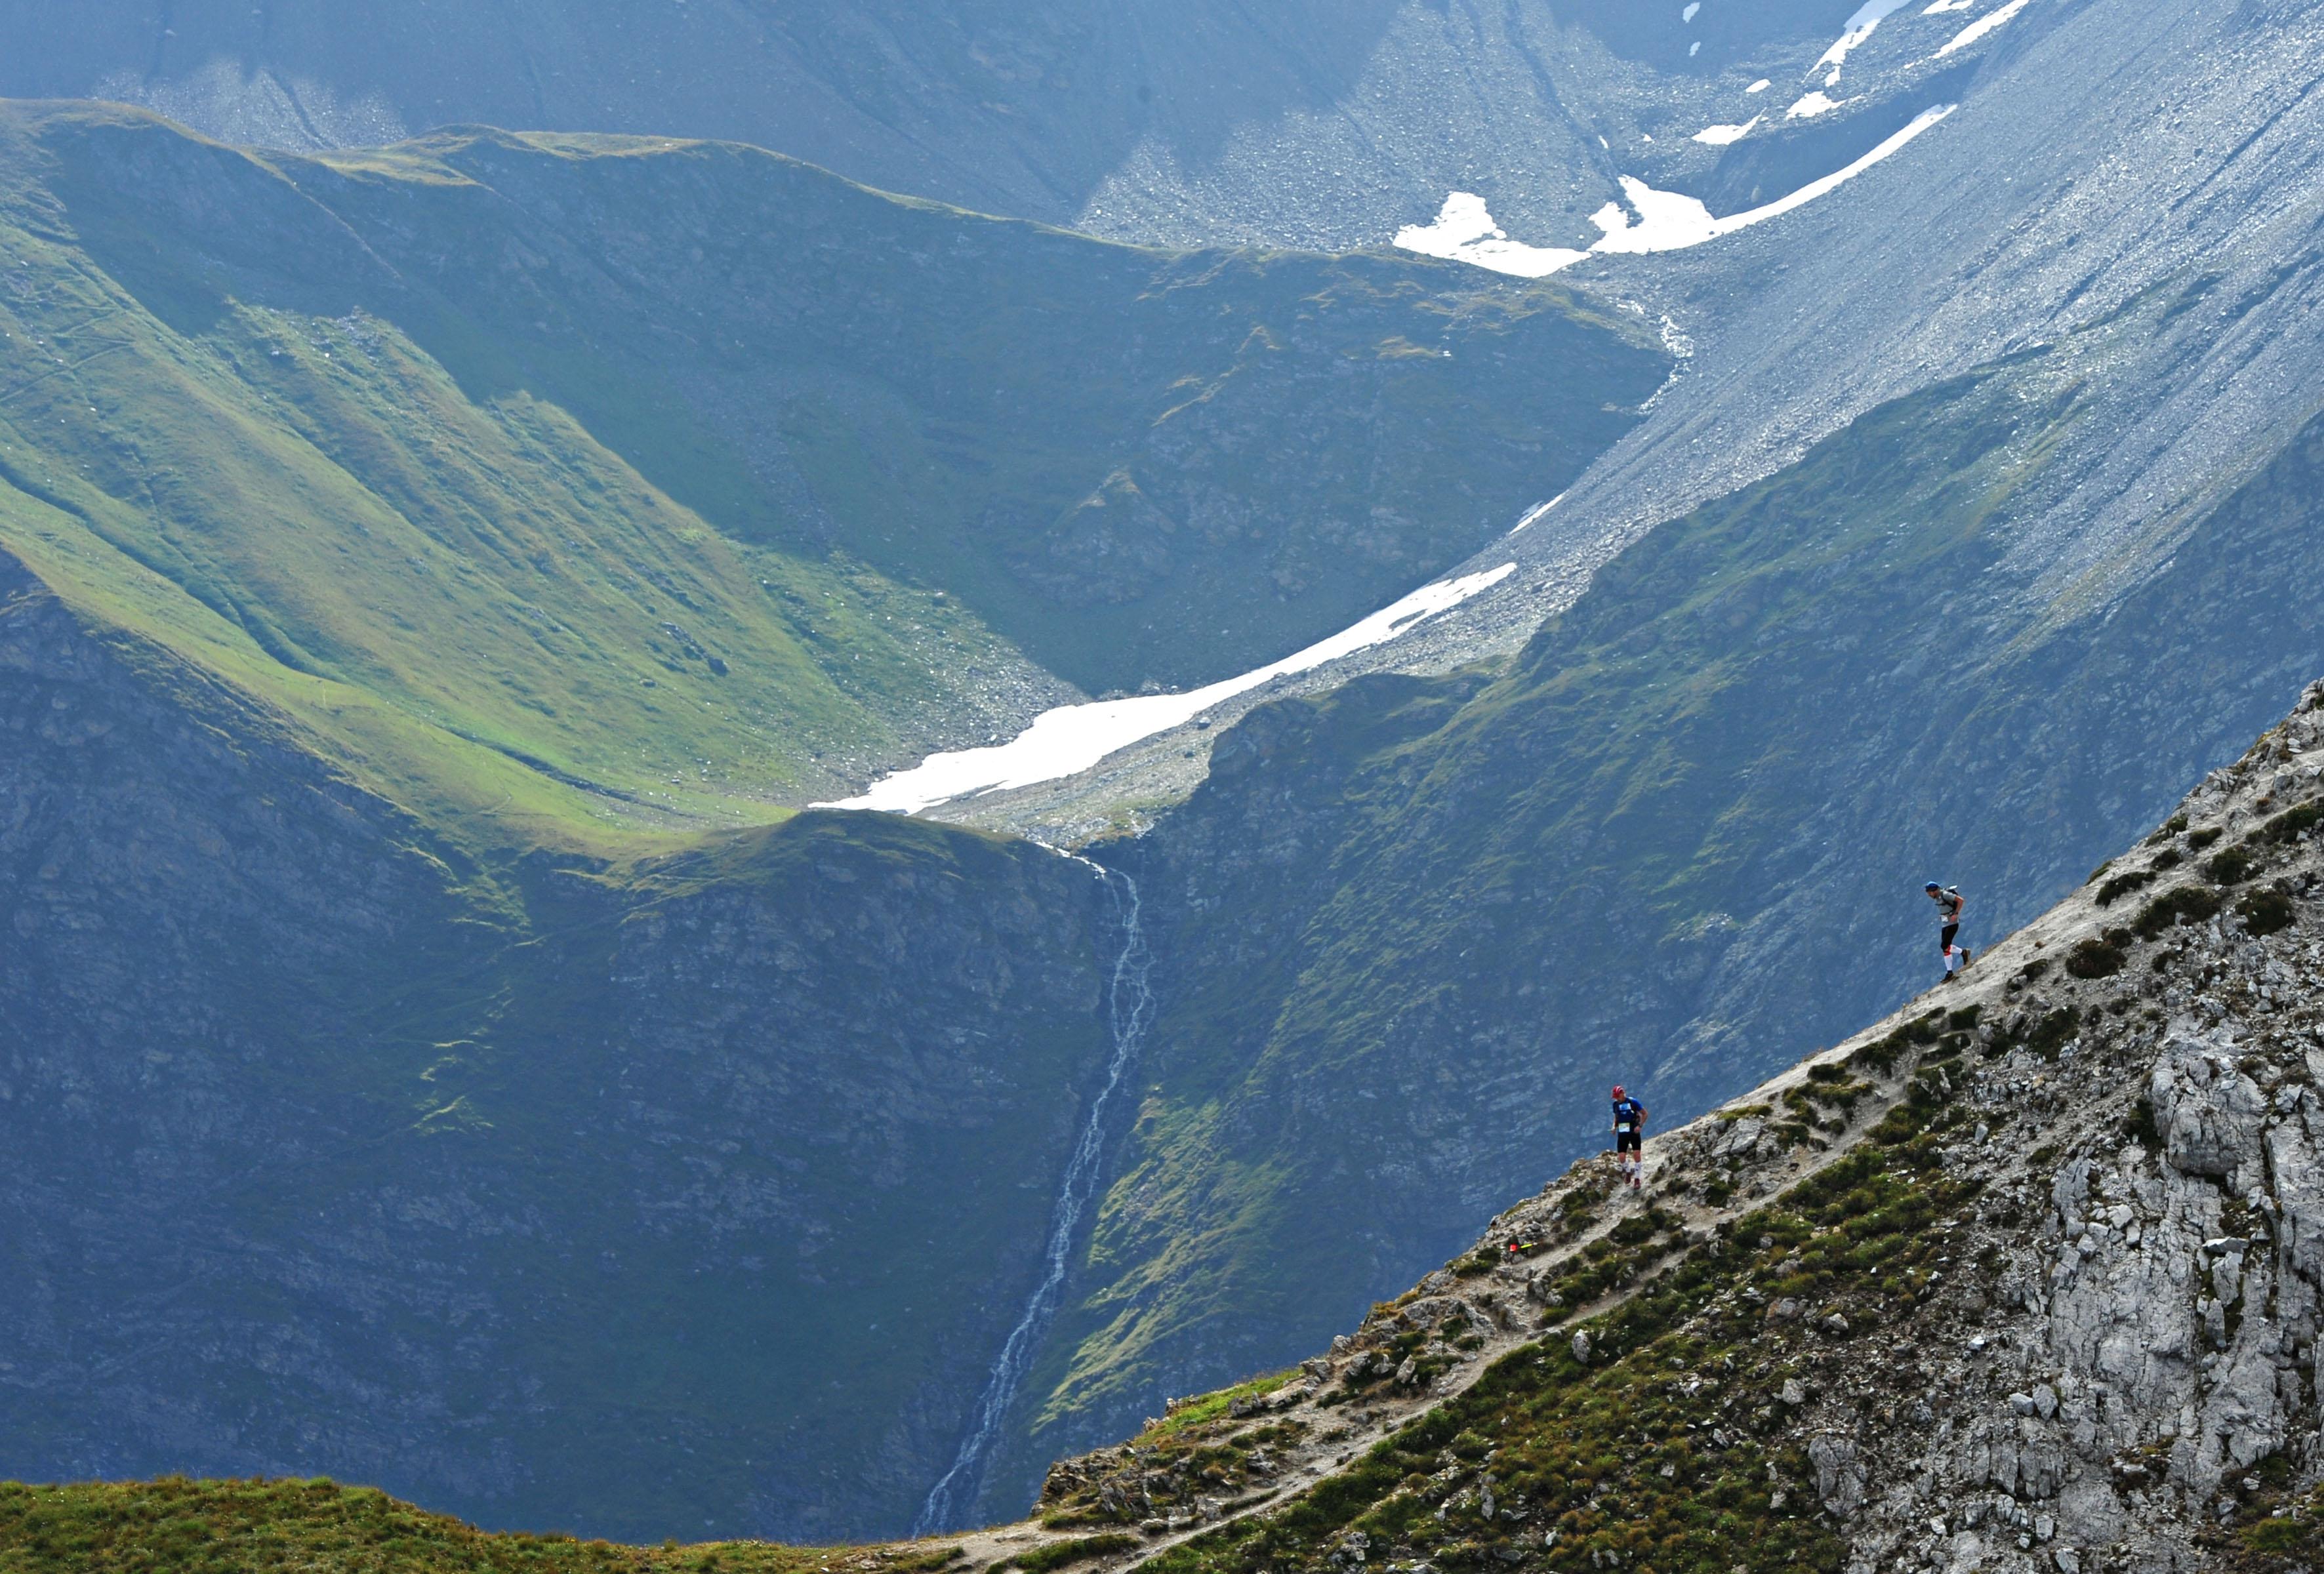 ultra trail du mont blanc 2013 thomasbohne